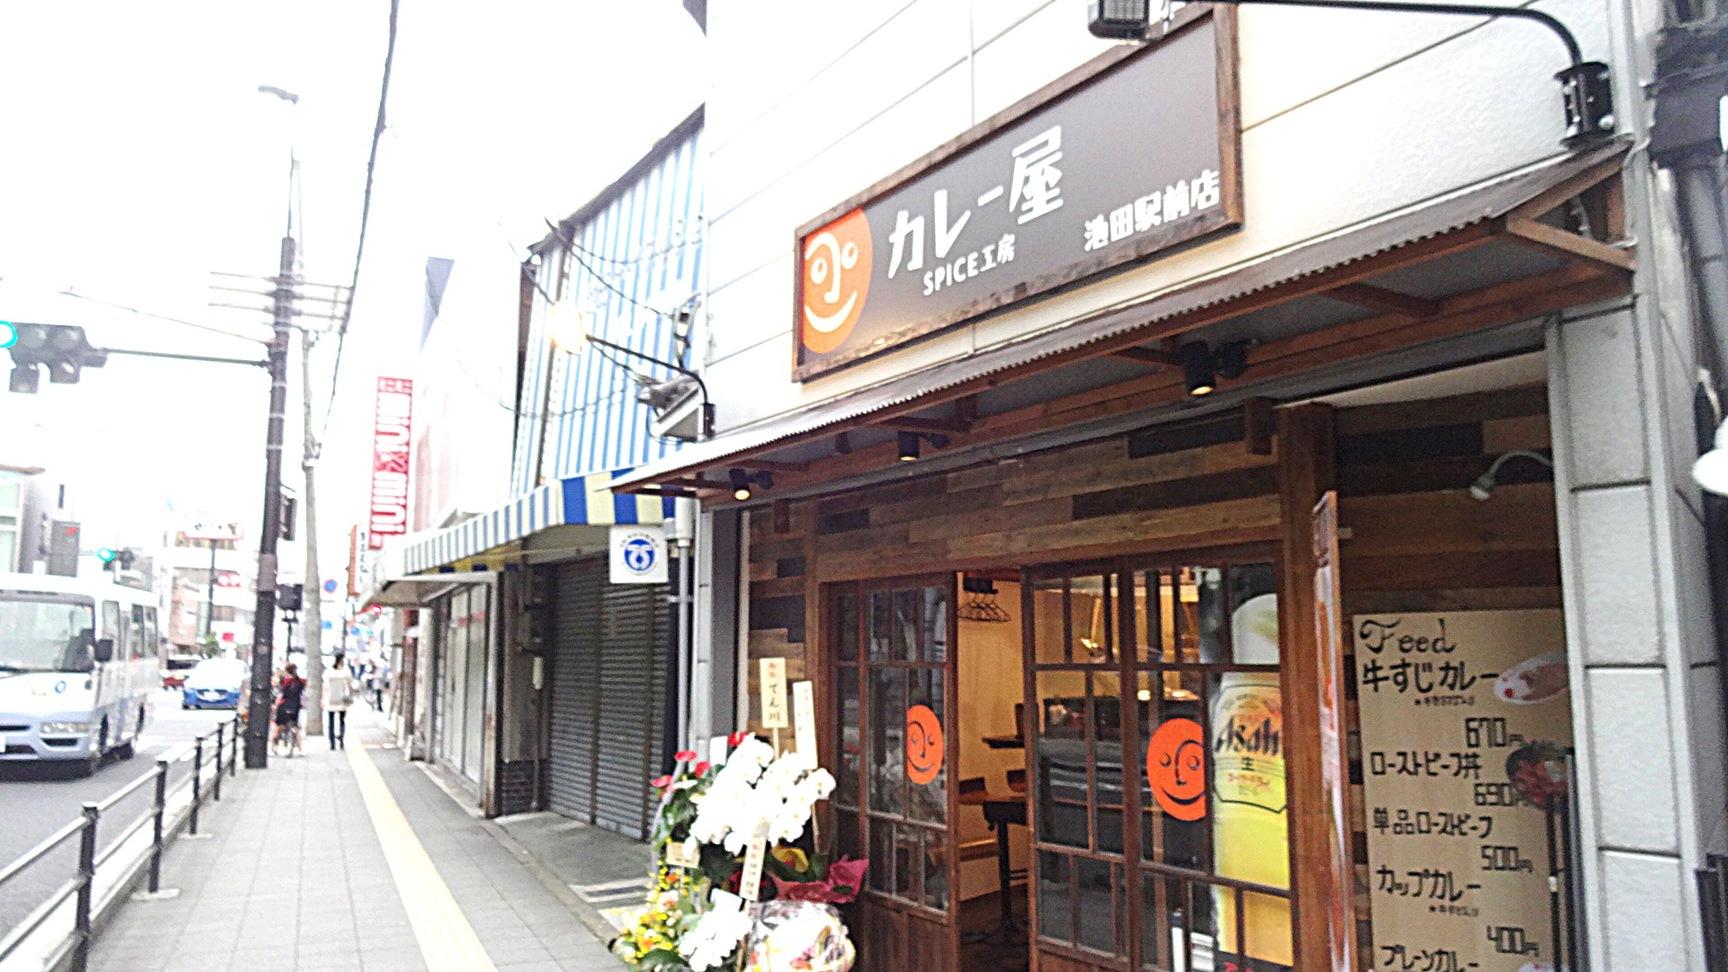 カレー屋 SPICE工房 池田駅前店